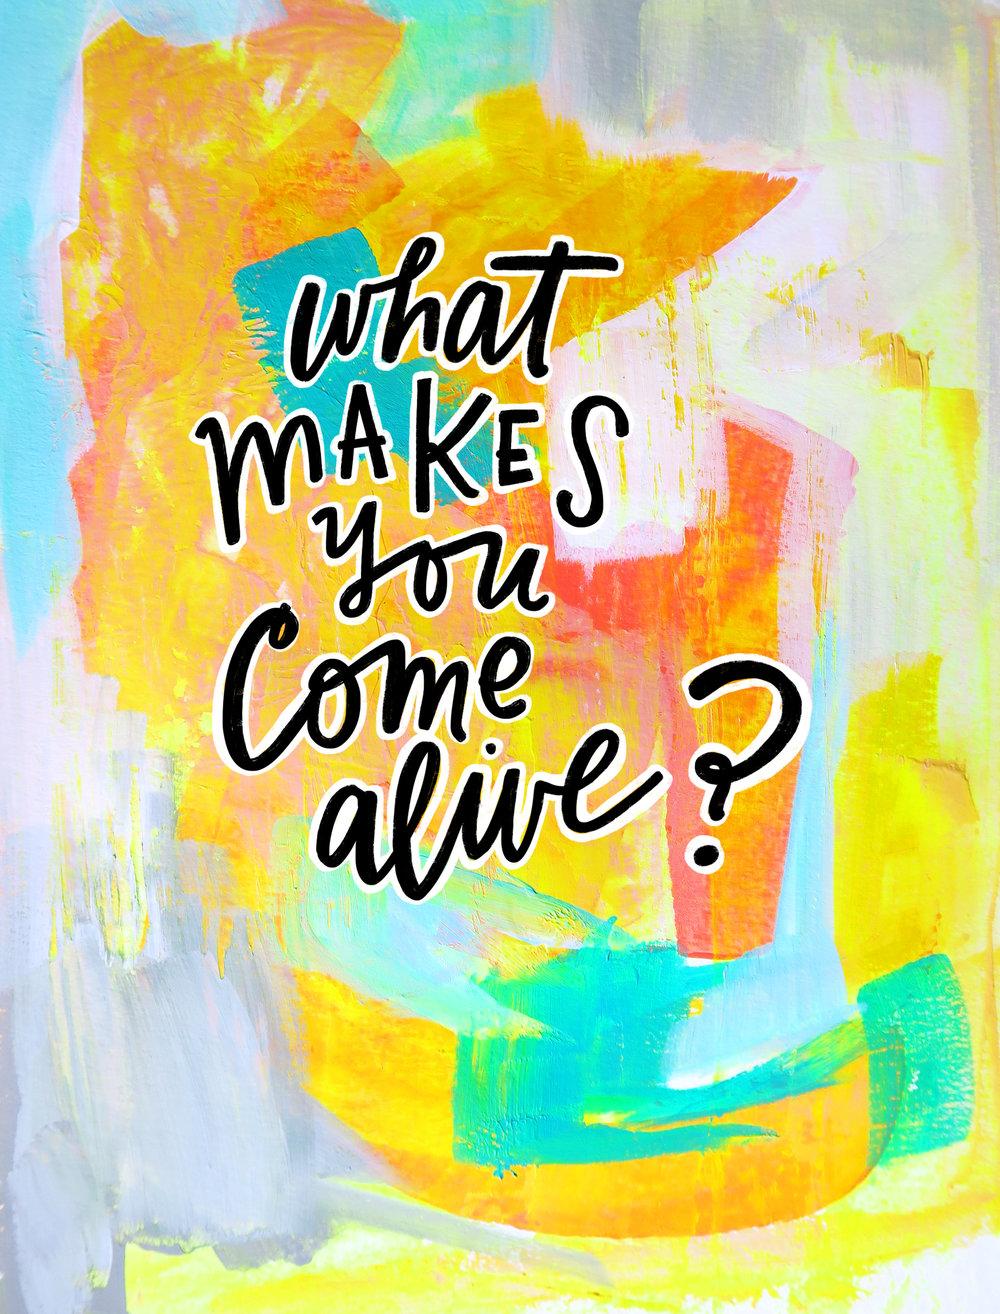 8/30/16: Alive